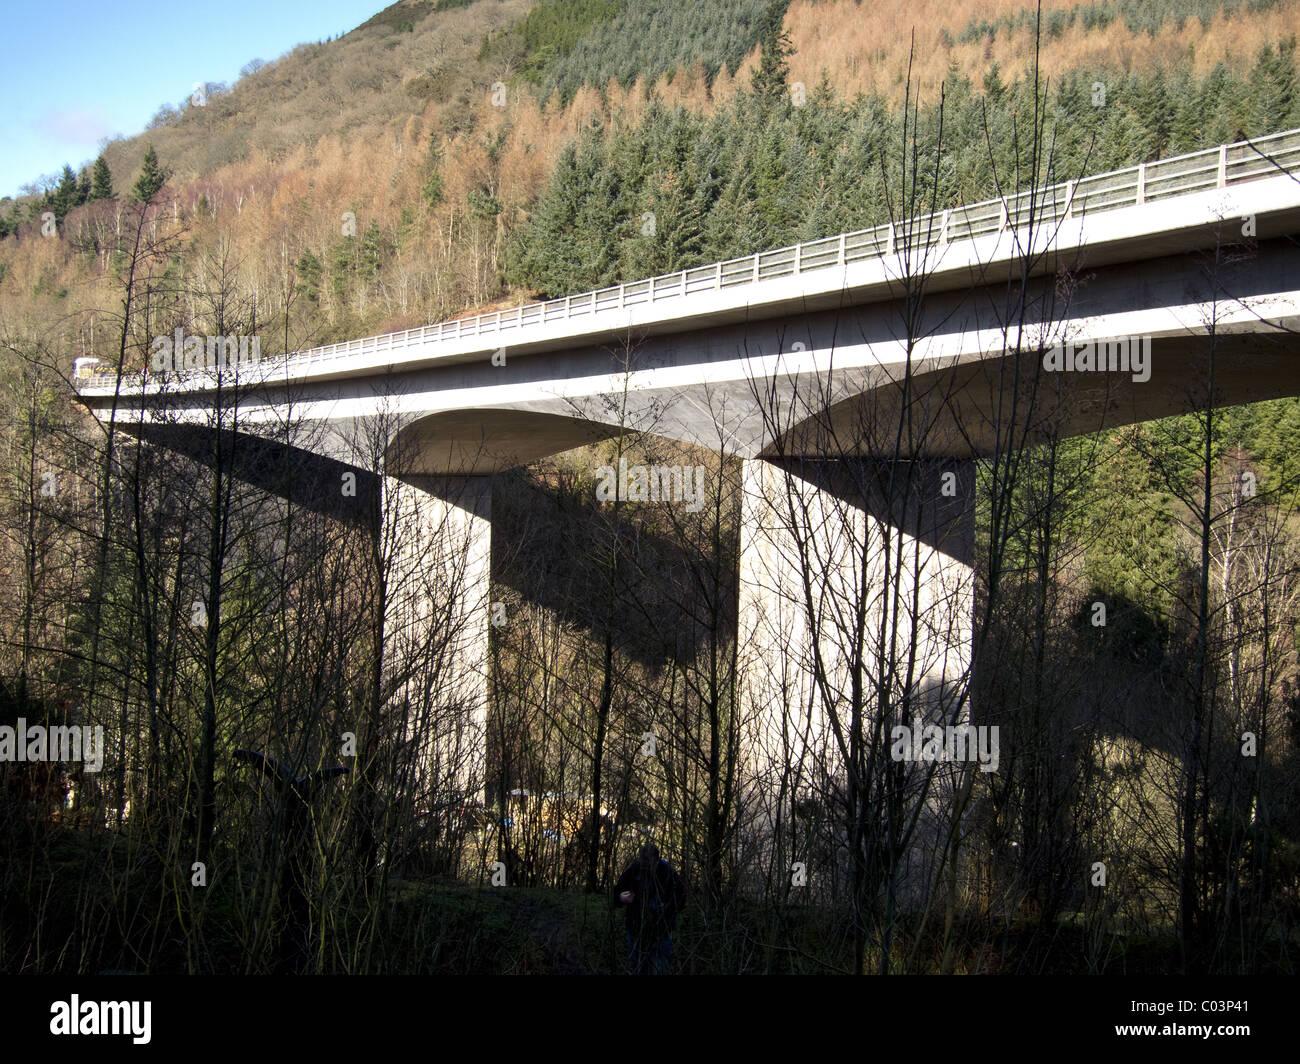 The concrete Greta Bridge in the Brundholme wood area of Keswick, Cumbria, UK. - Stock Image